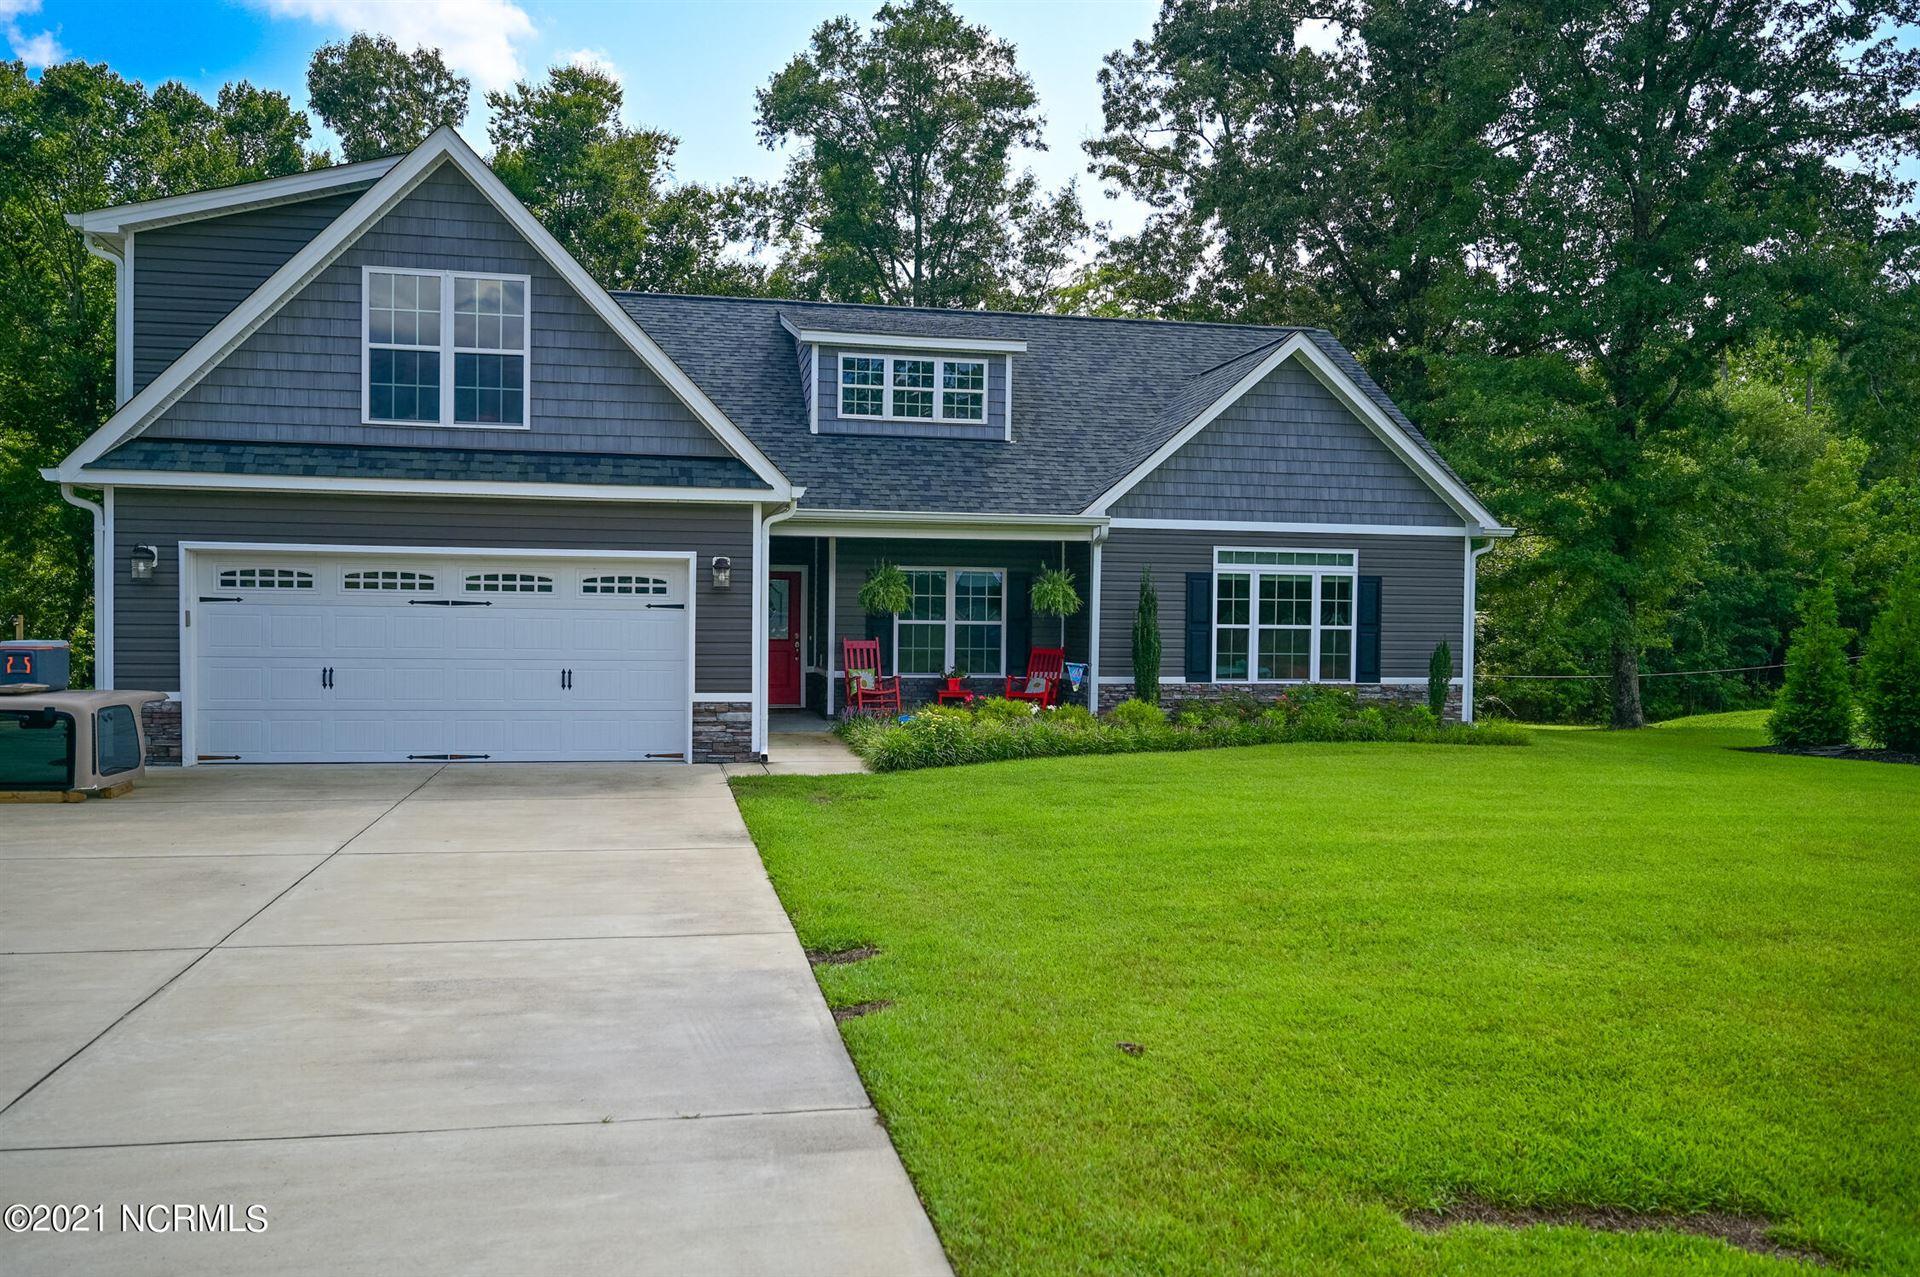 Photo of 311 Tina Mae Drive, Vanceboro, NC 28586 (MLS # 100287953)